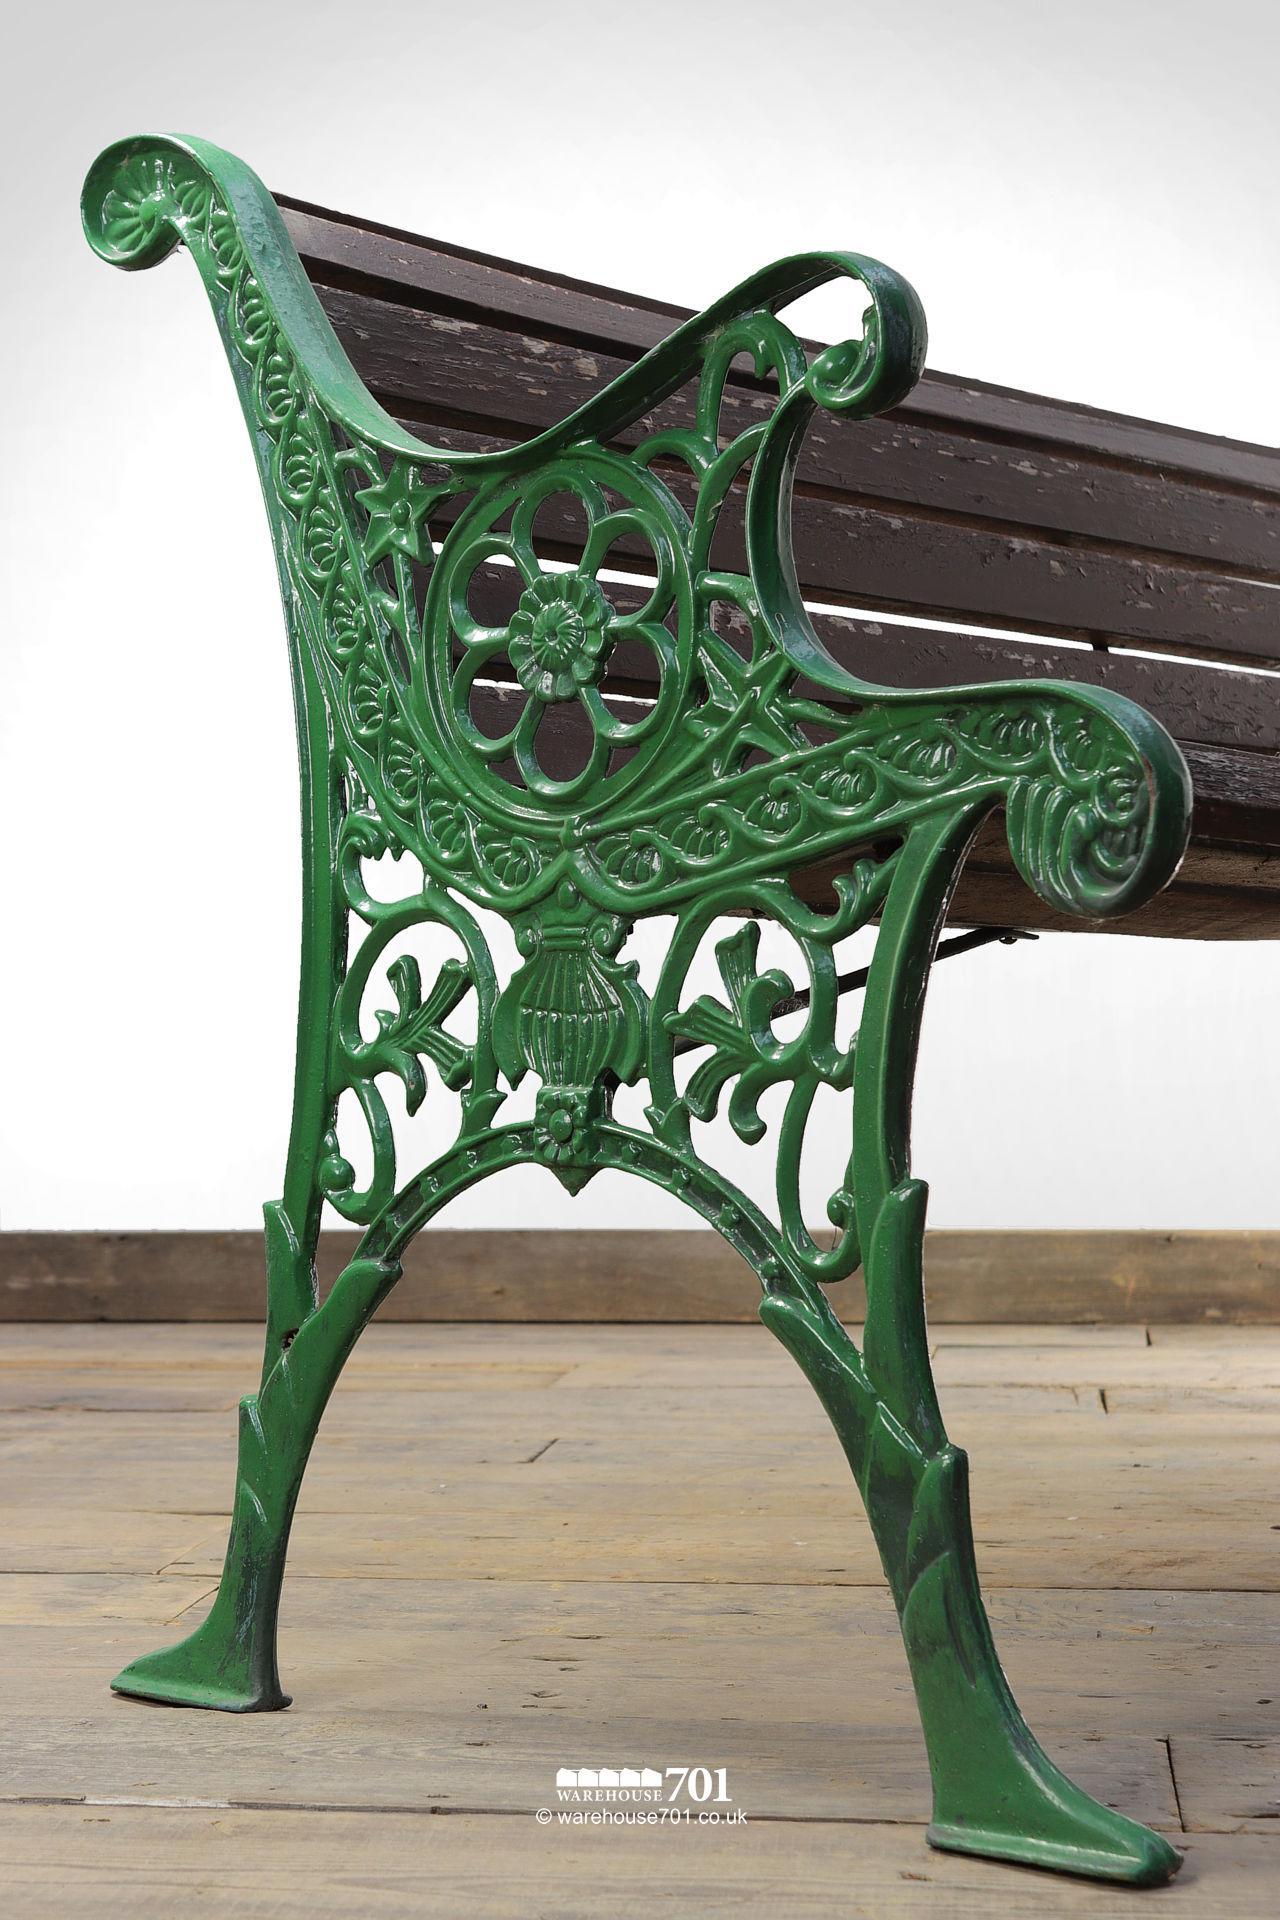 Vintage Green Cast Iron Ended Wood Slat Bench